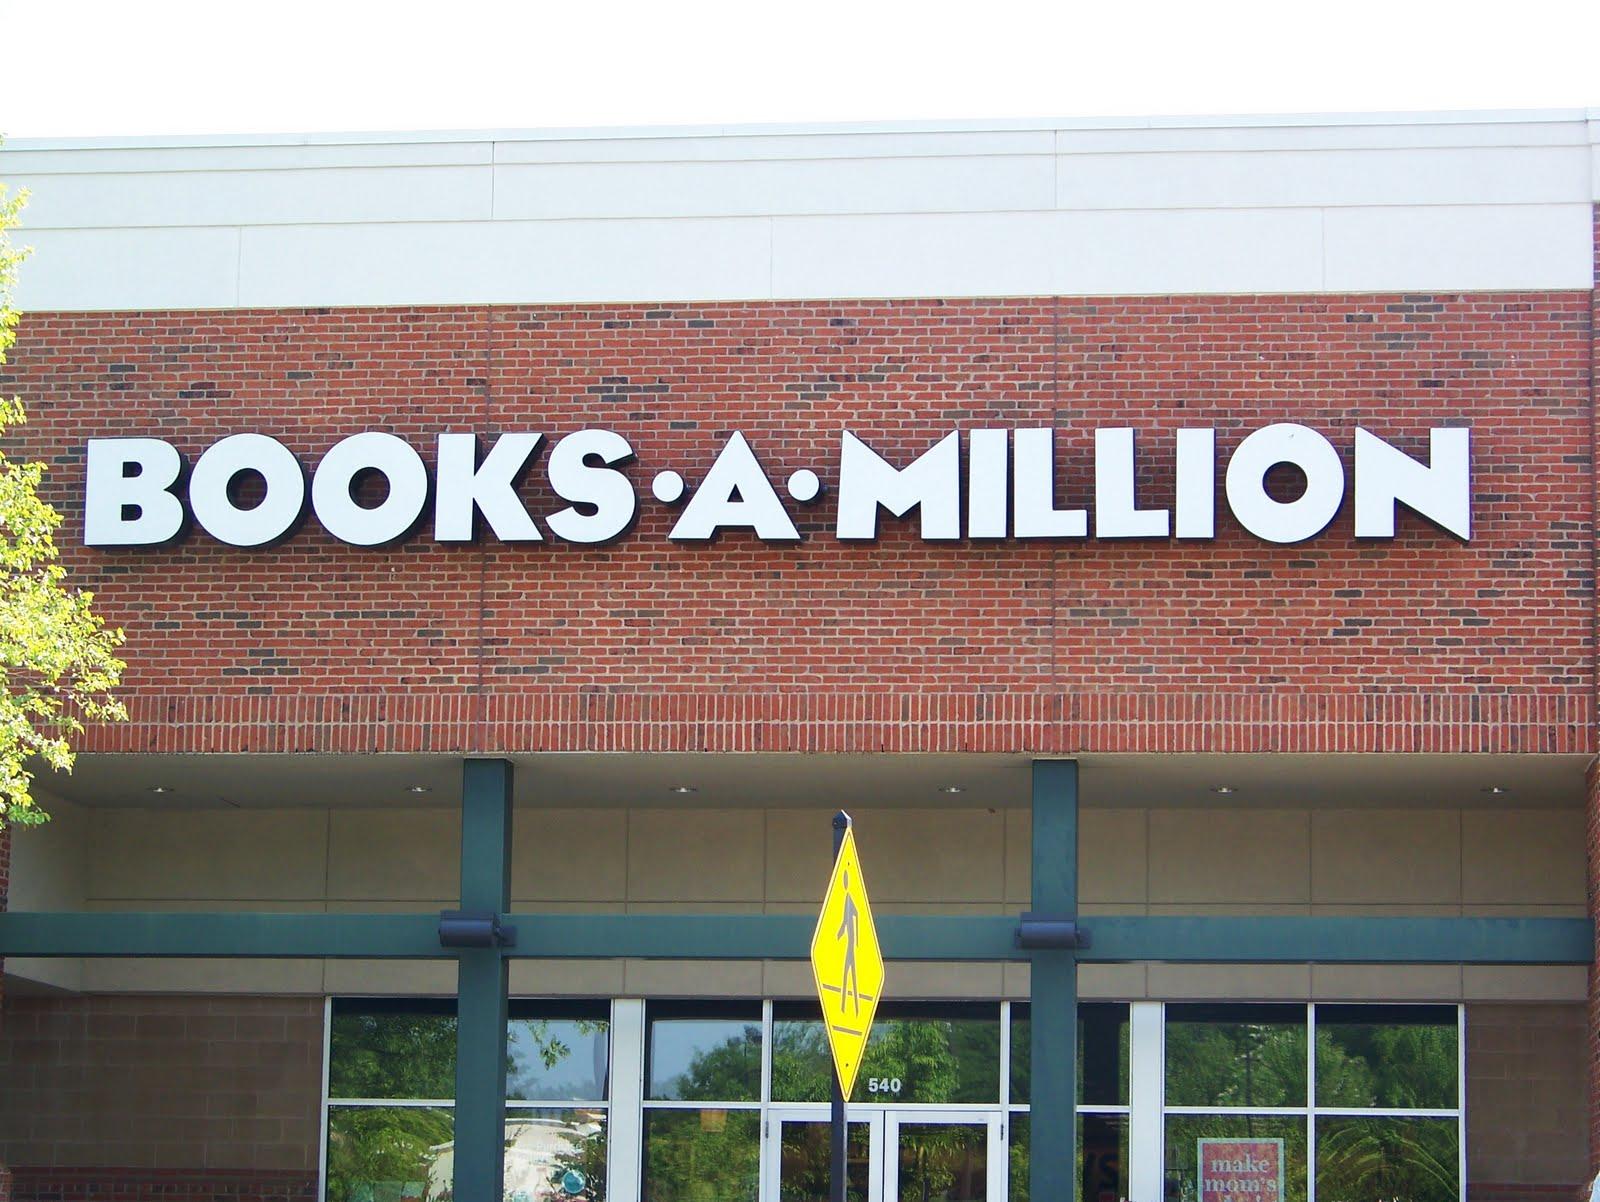 books million barrington stuart bought novel woods matt went per stone request